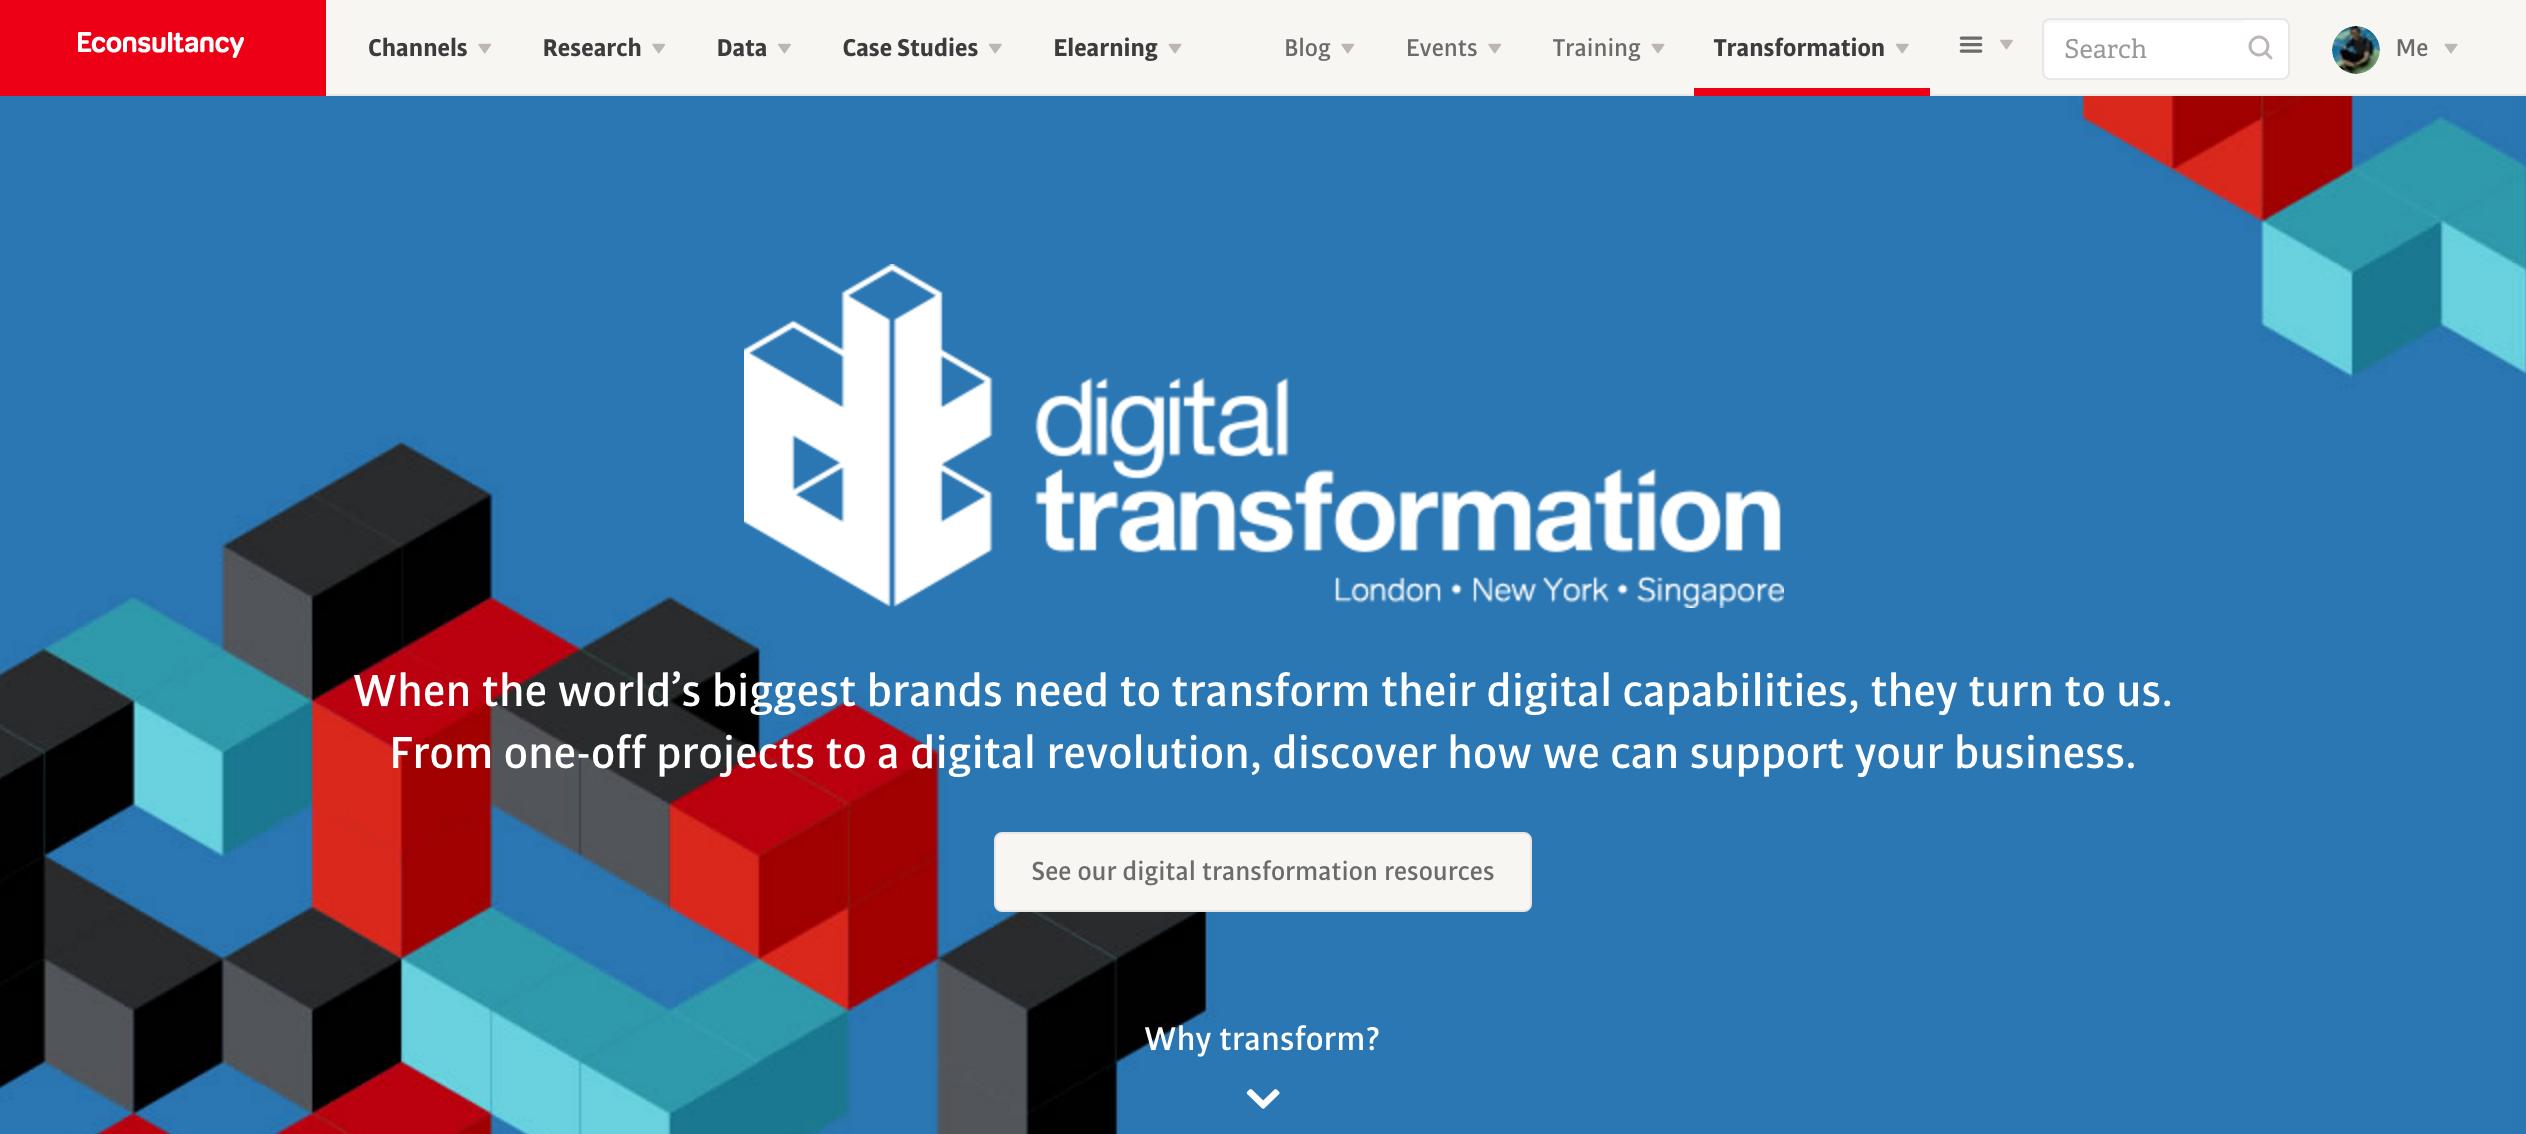 econsultancy digital transformation page